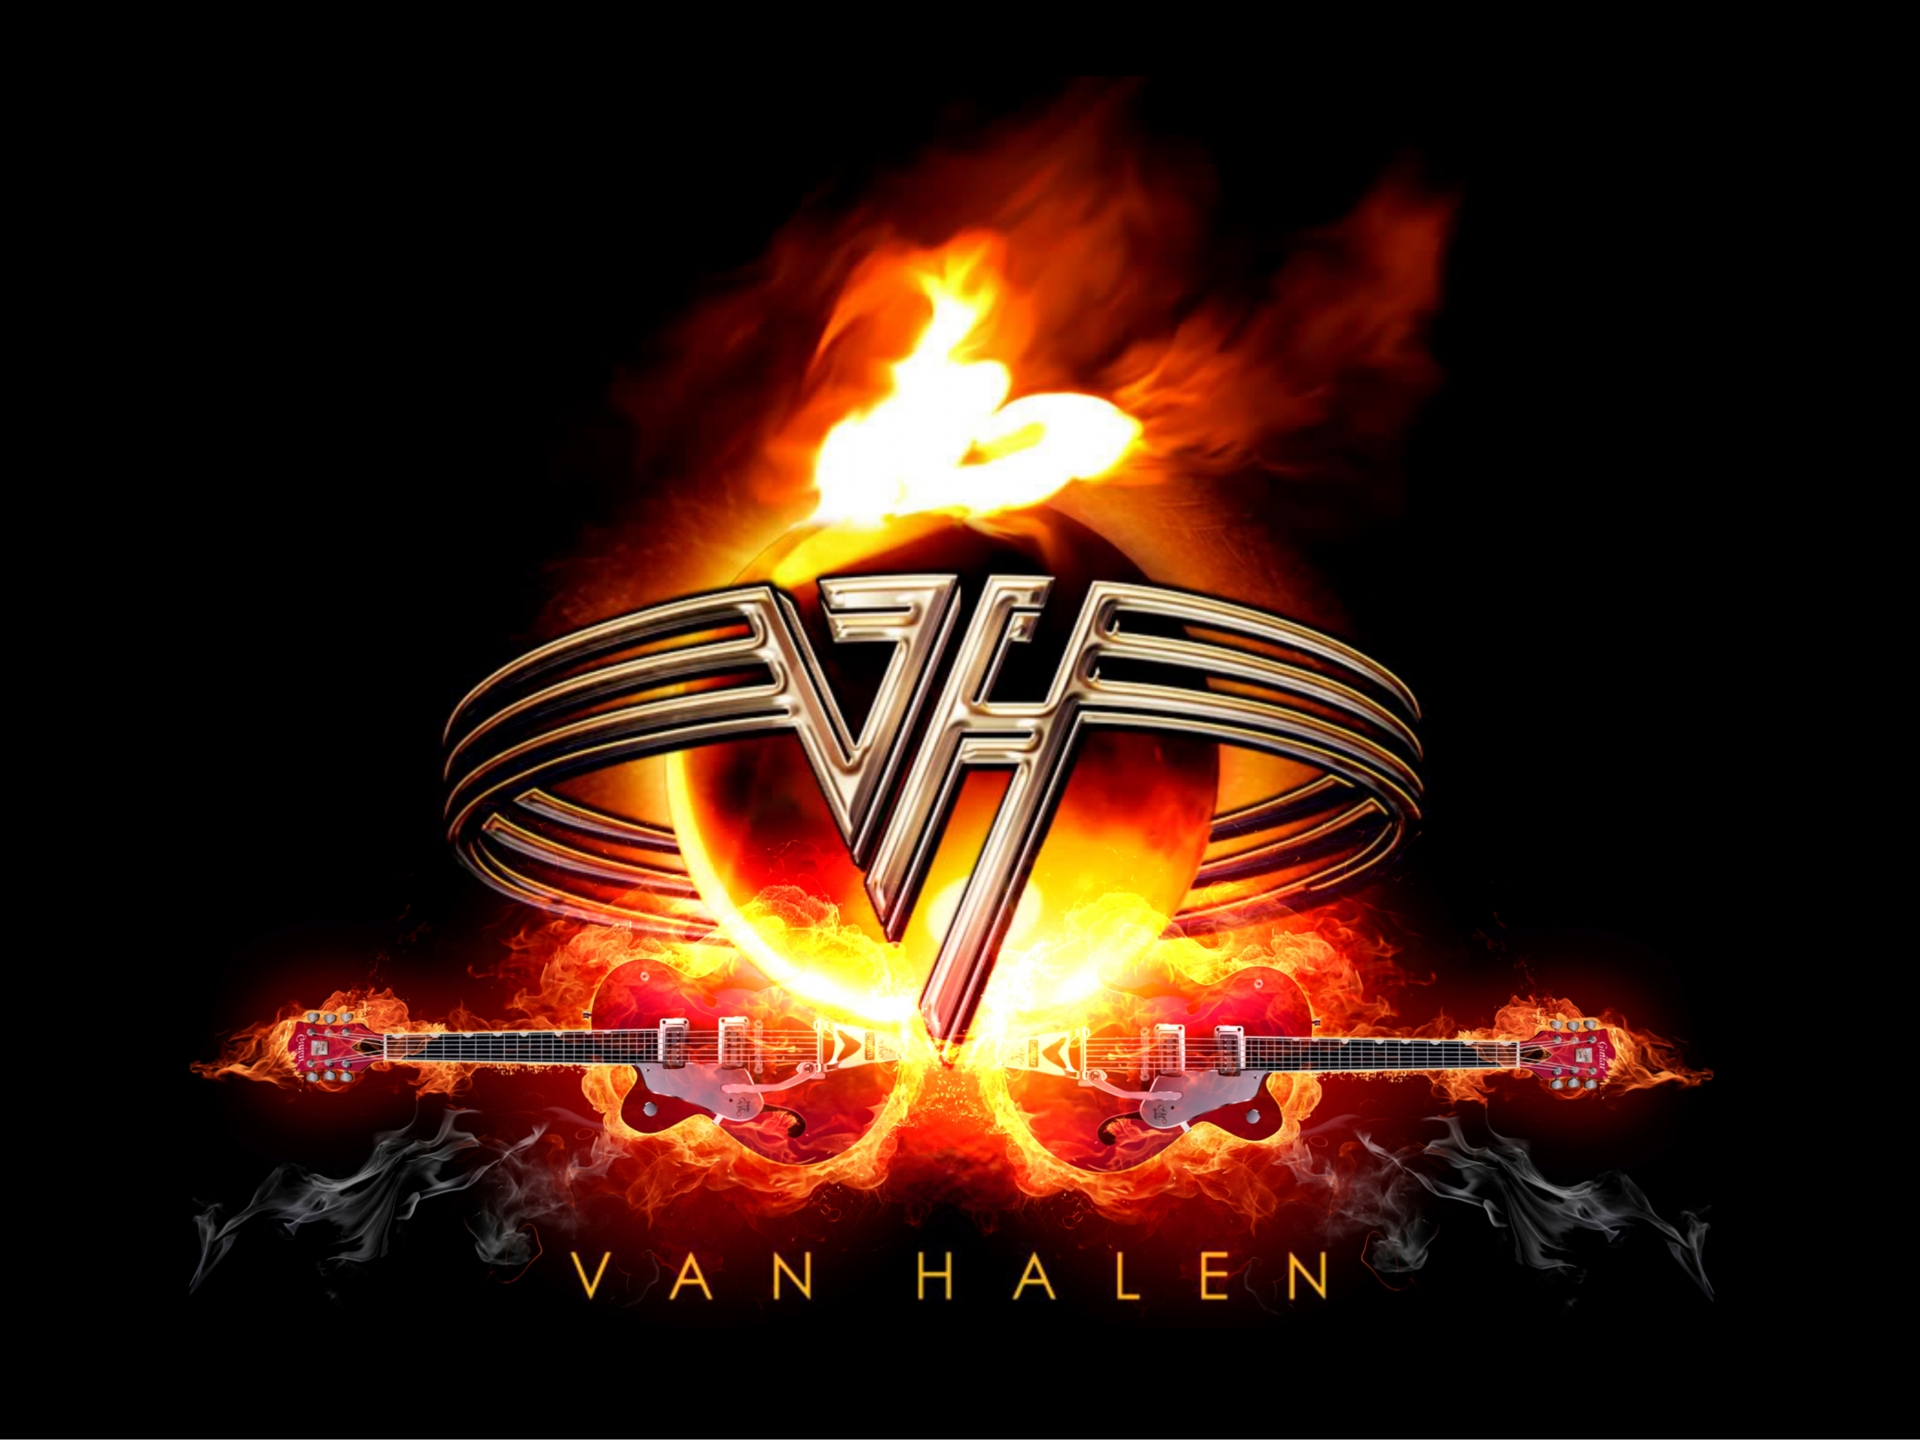 VAN HALEN heavy metal hard rock bands guitar e wallpaper 1920x1440